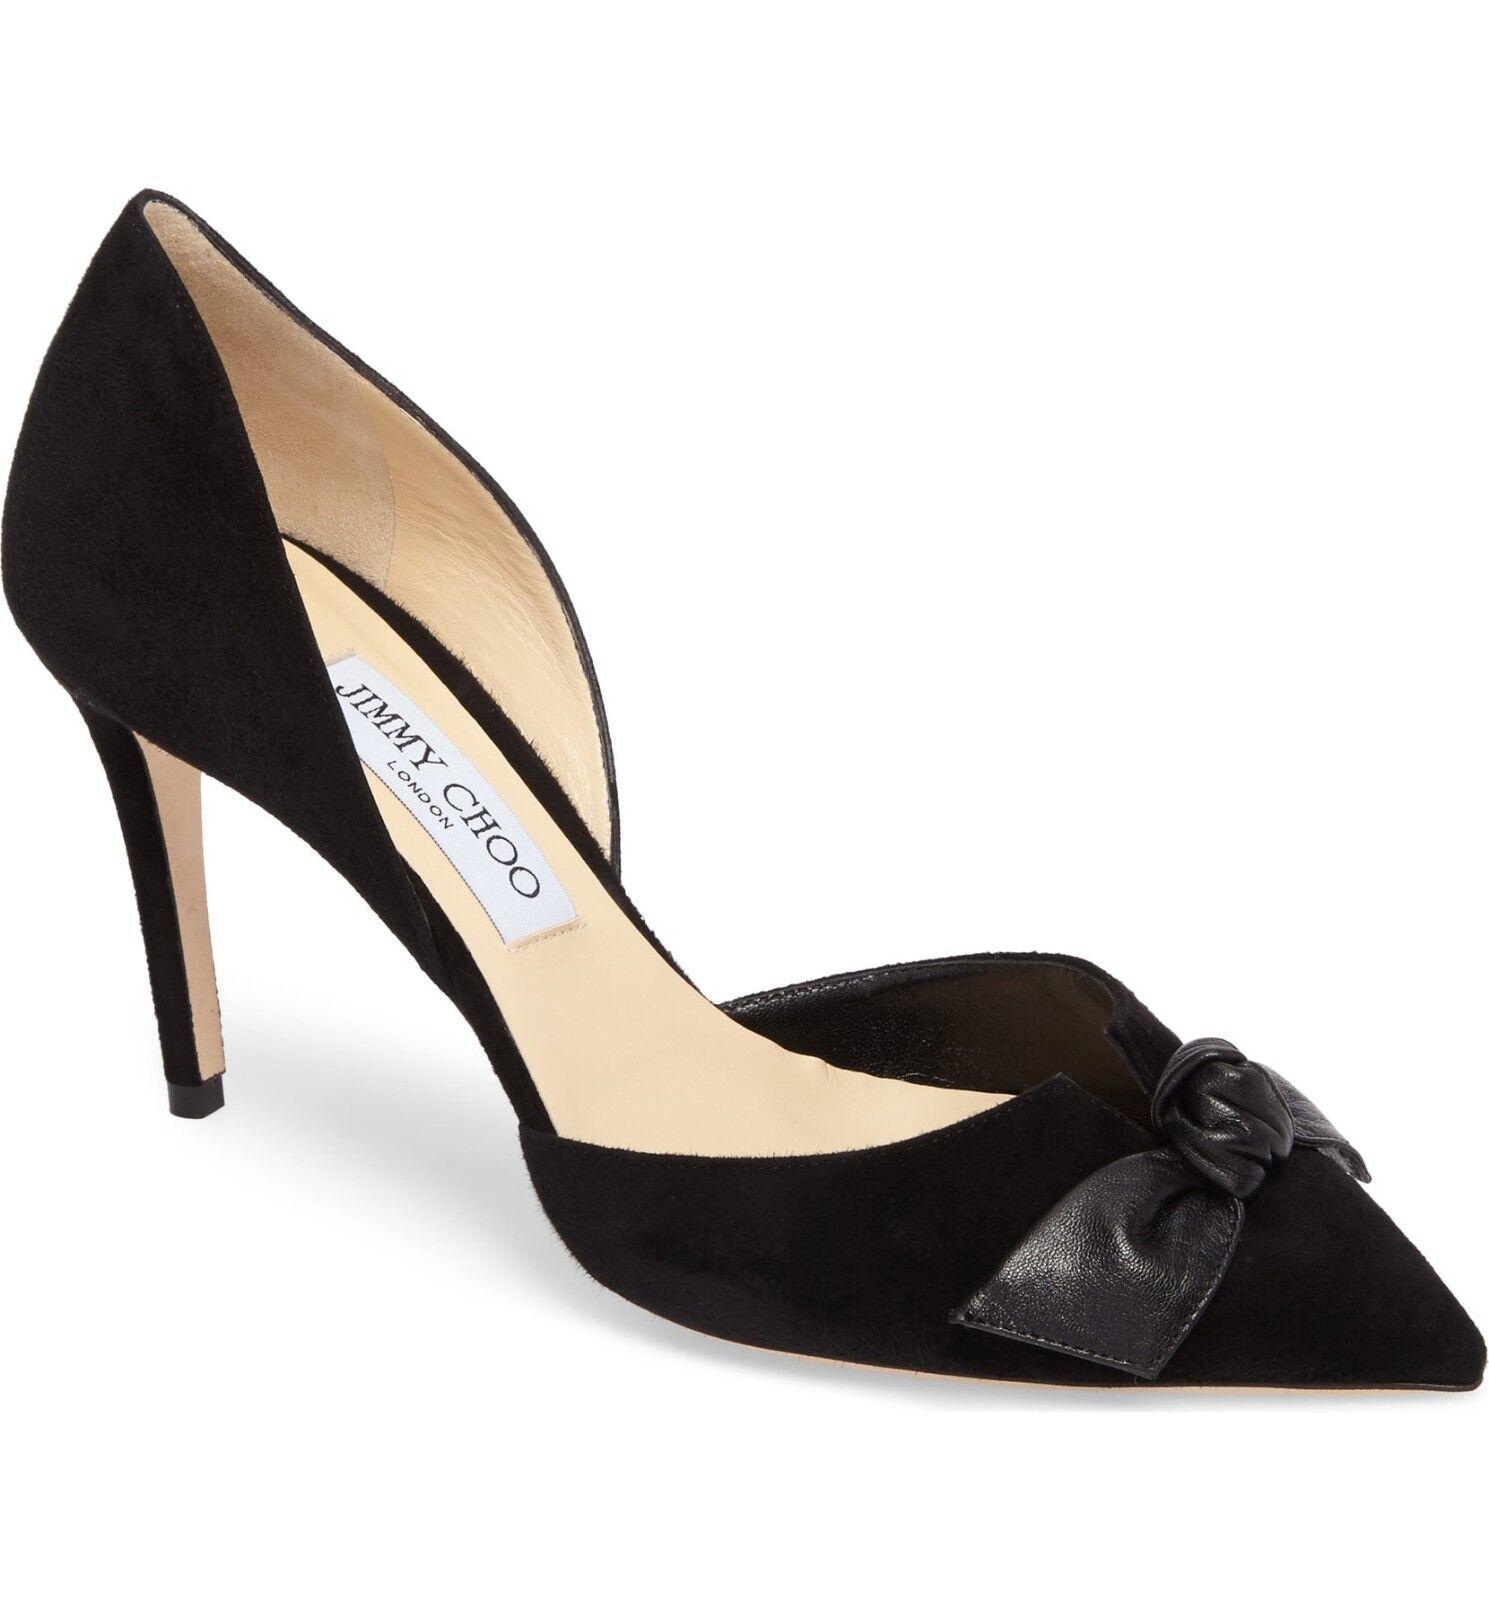 NIB Jimmy Choo Twinkle Knotted Bow Pointed Toe Pump Pump Pump Heel shoes Black Suede 39-8.5 1e57b3